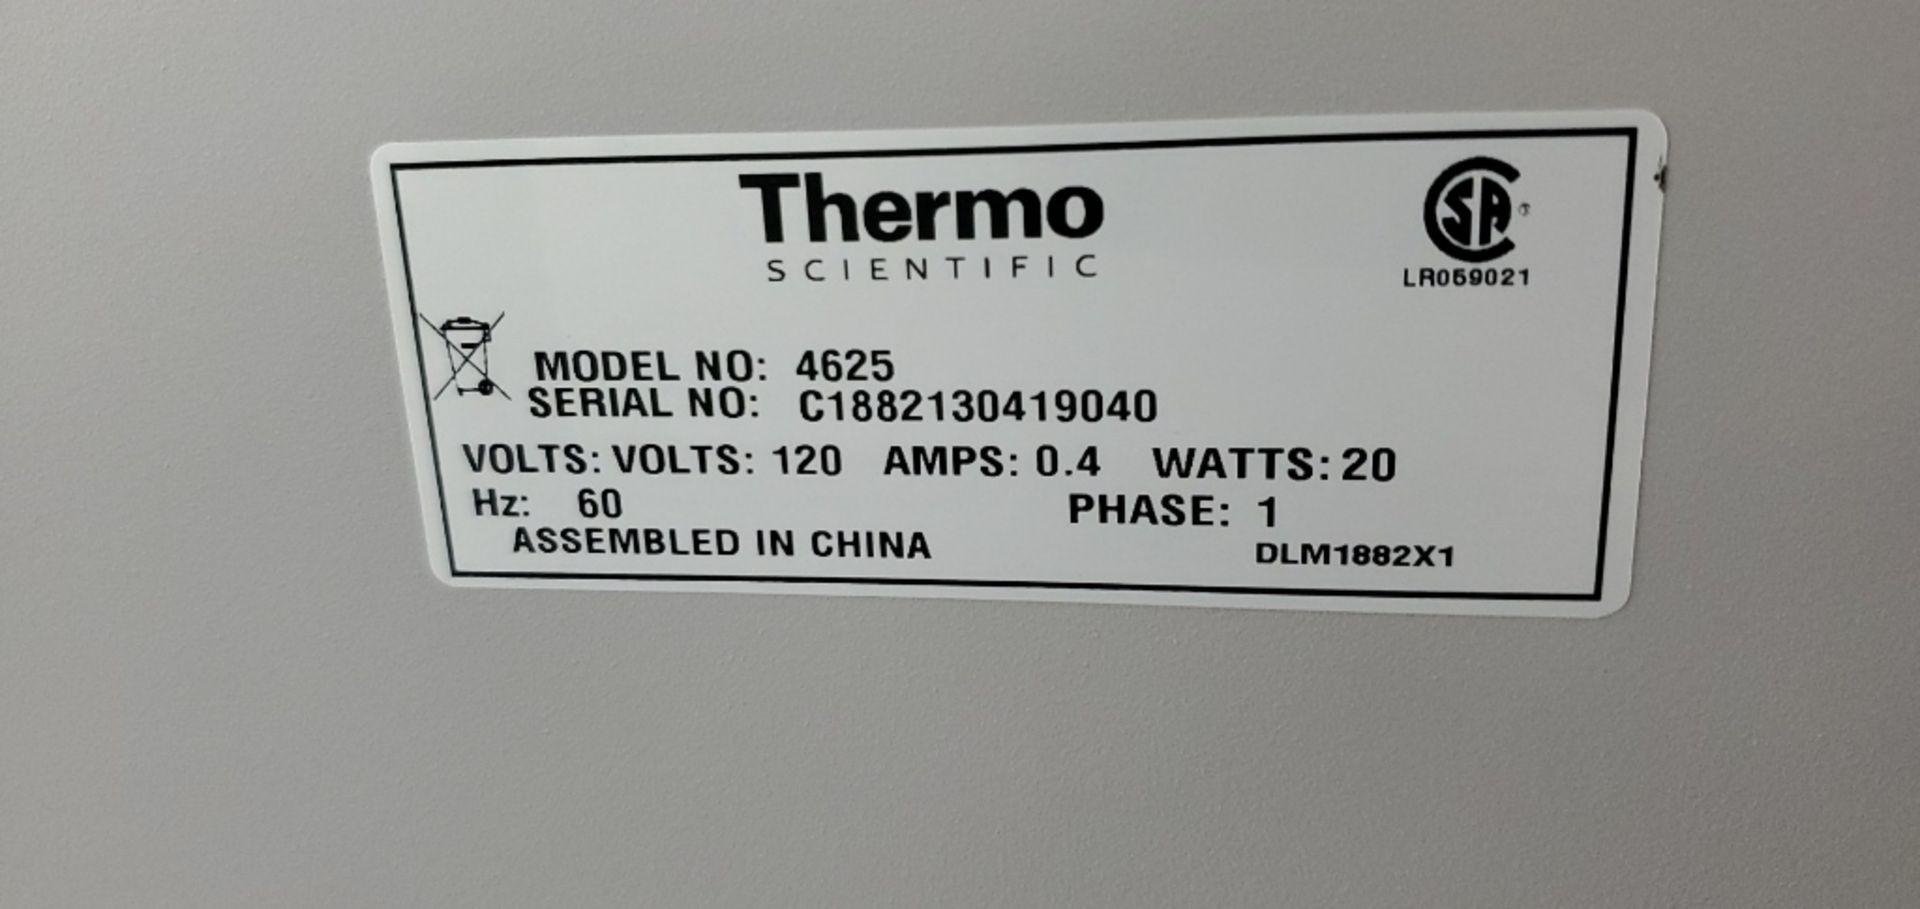 Lot 23 - Thermo Scientific Model 4625 Titer Plate Shaker